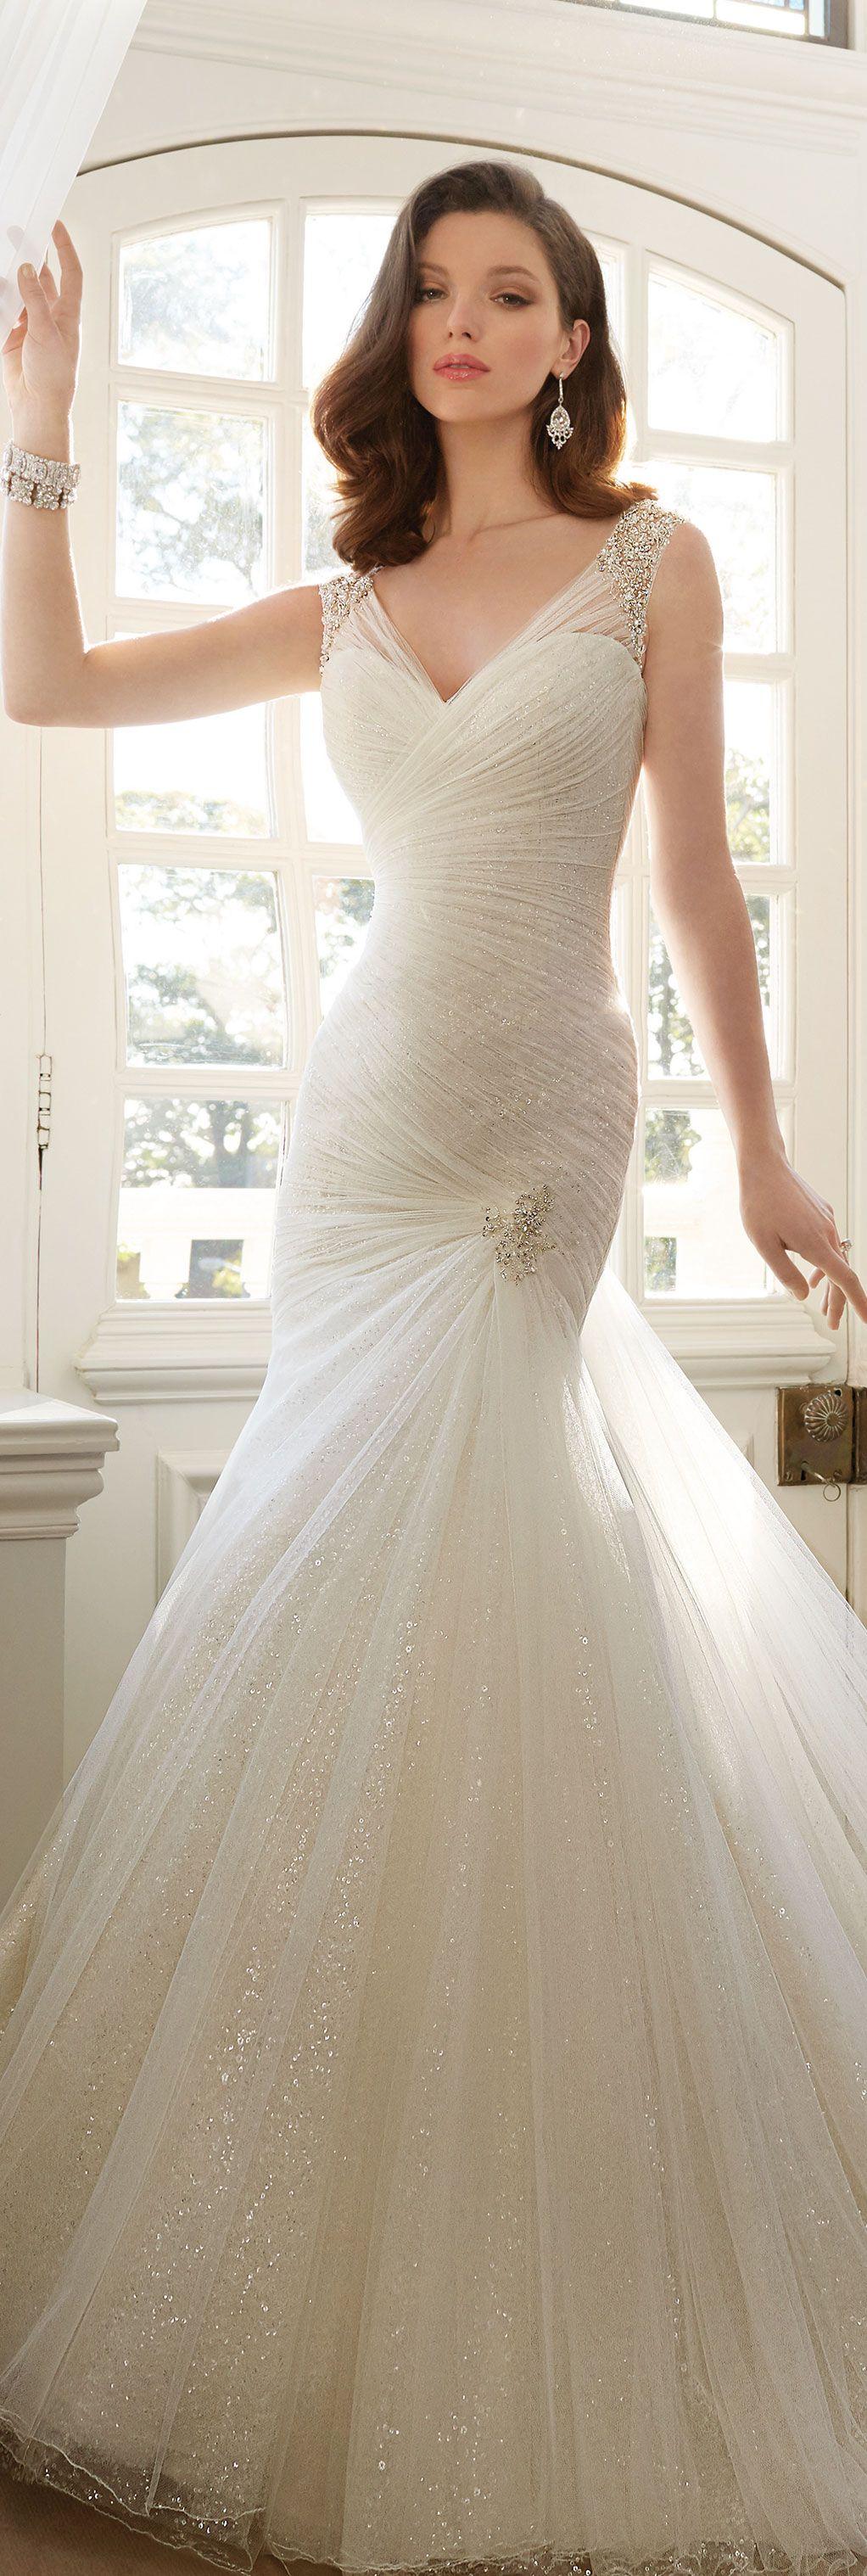 The Sophia Tolli Spring 2016 Wedding Dress Collection - Style No. Y11640 -  Candace  tulleweddingdress Maya Earrings www.davidtuteraembellish.com 531ef670e9